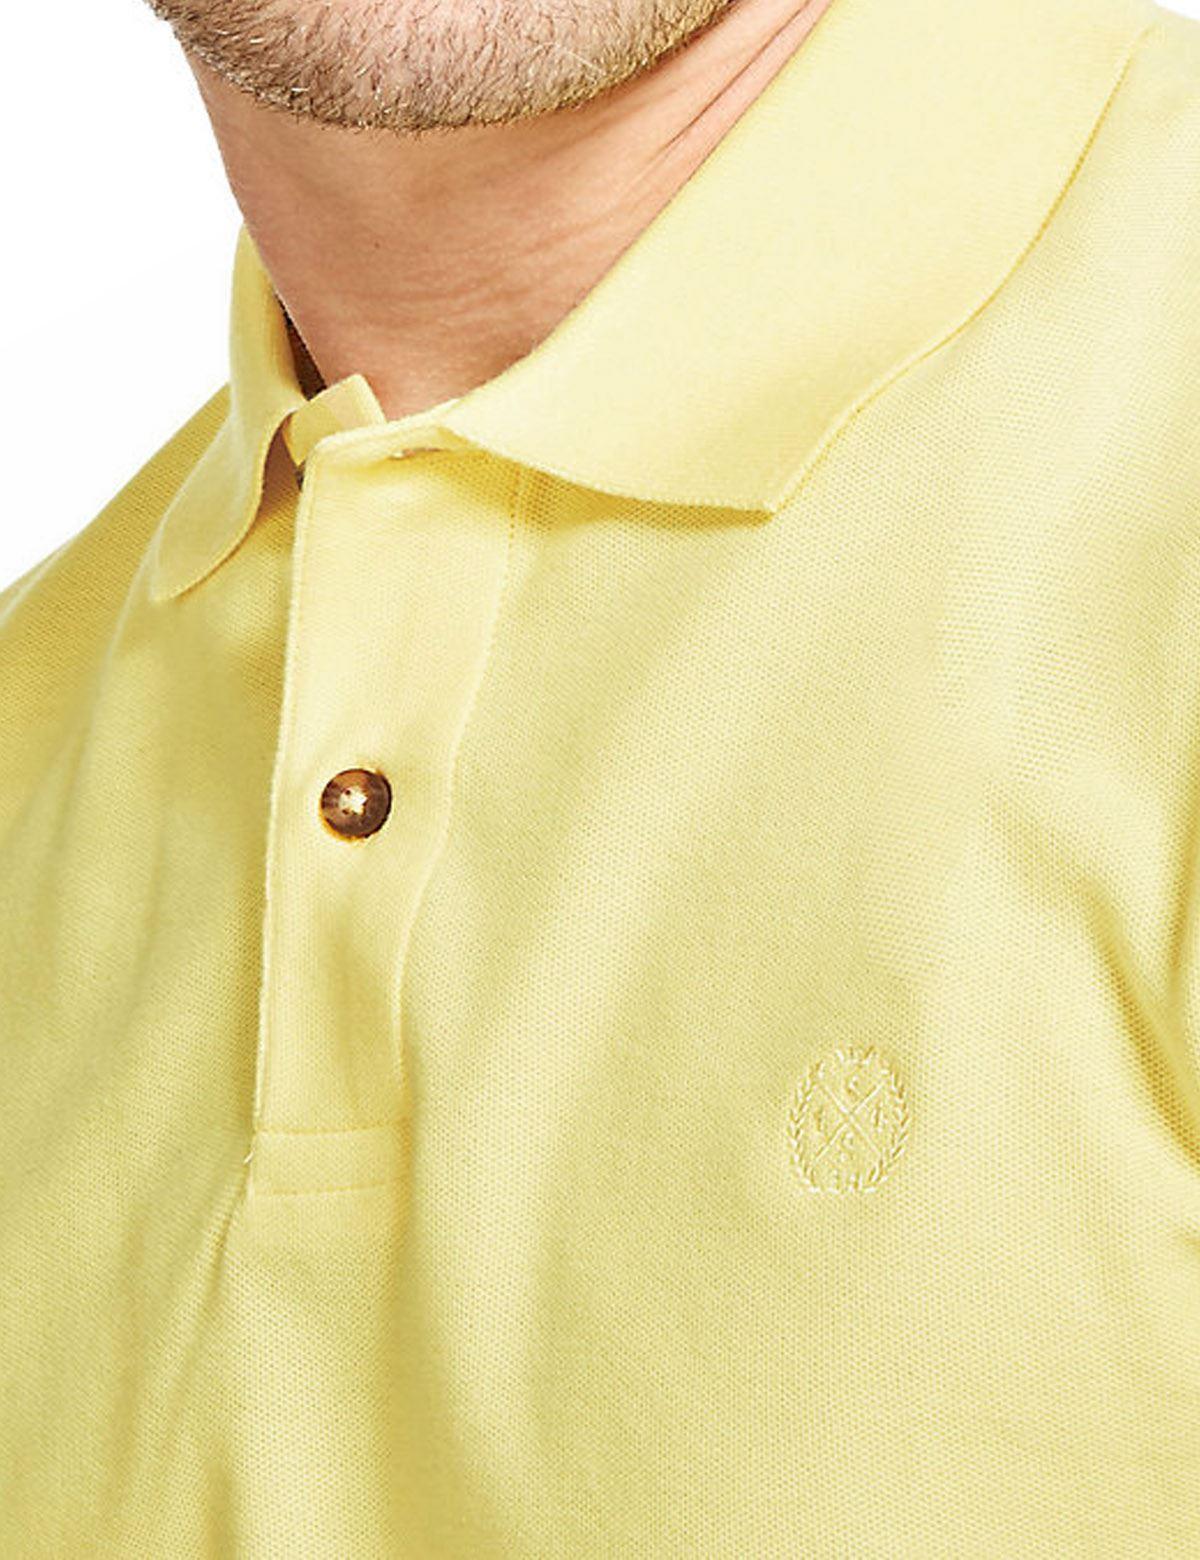 Ex-M-amp-S-Mens-Cotton-Polo-Shirt-Marks-amp-Spencer-Blue-Harbour-Size-S-M thumbnail 13